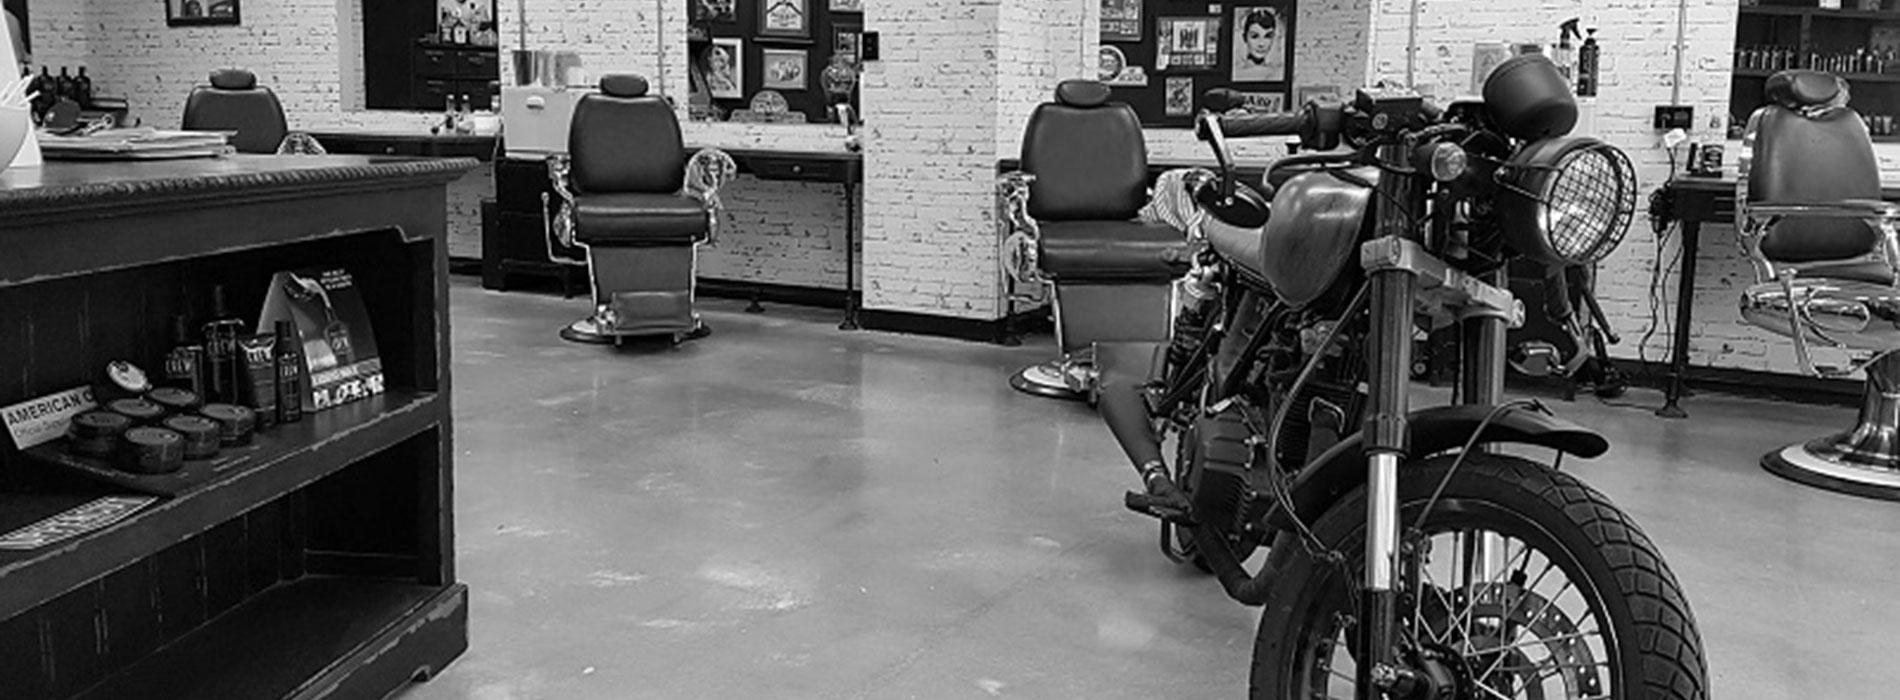 Barbershop by ZIGZAG, The Top Barbershop in Sorrento Quay in Hillarys